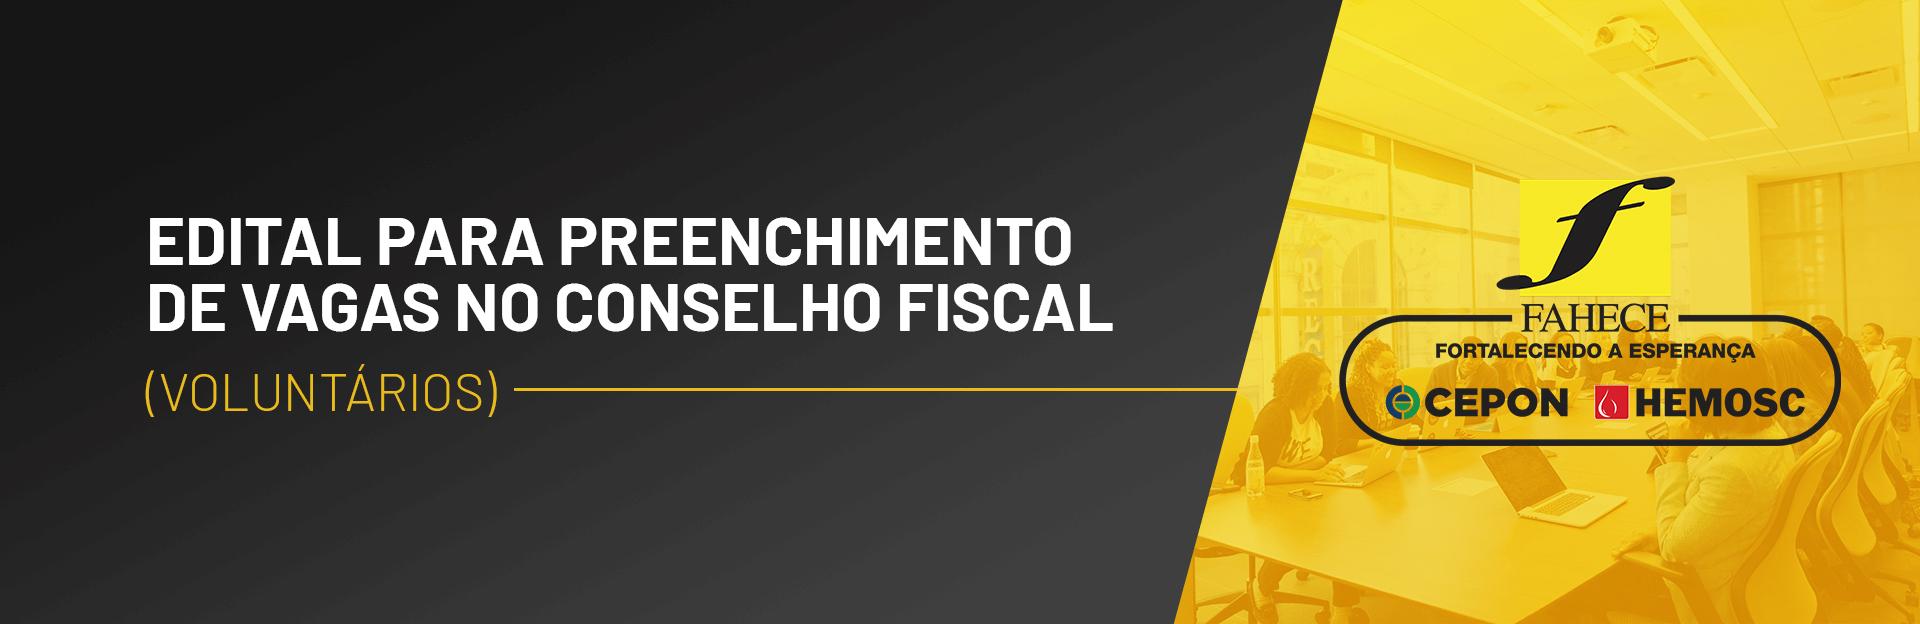 Edital preenchimento de vagas no Conselho Fiscal